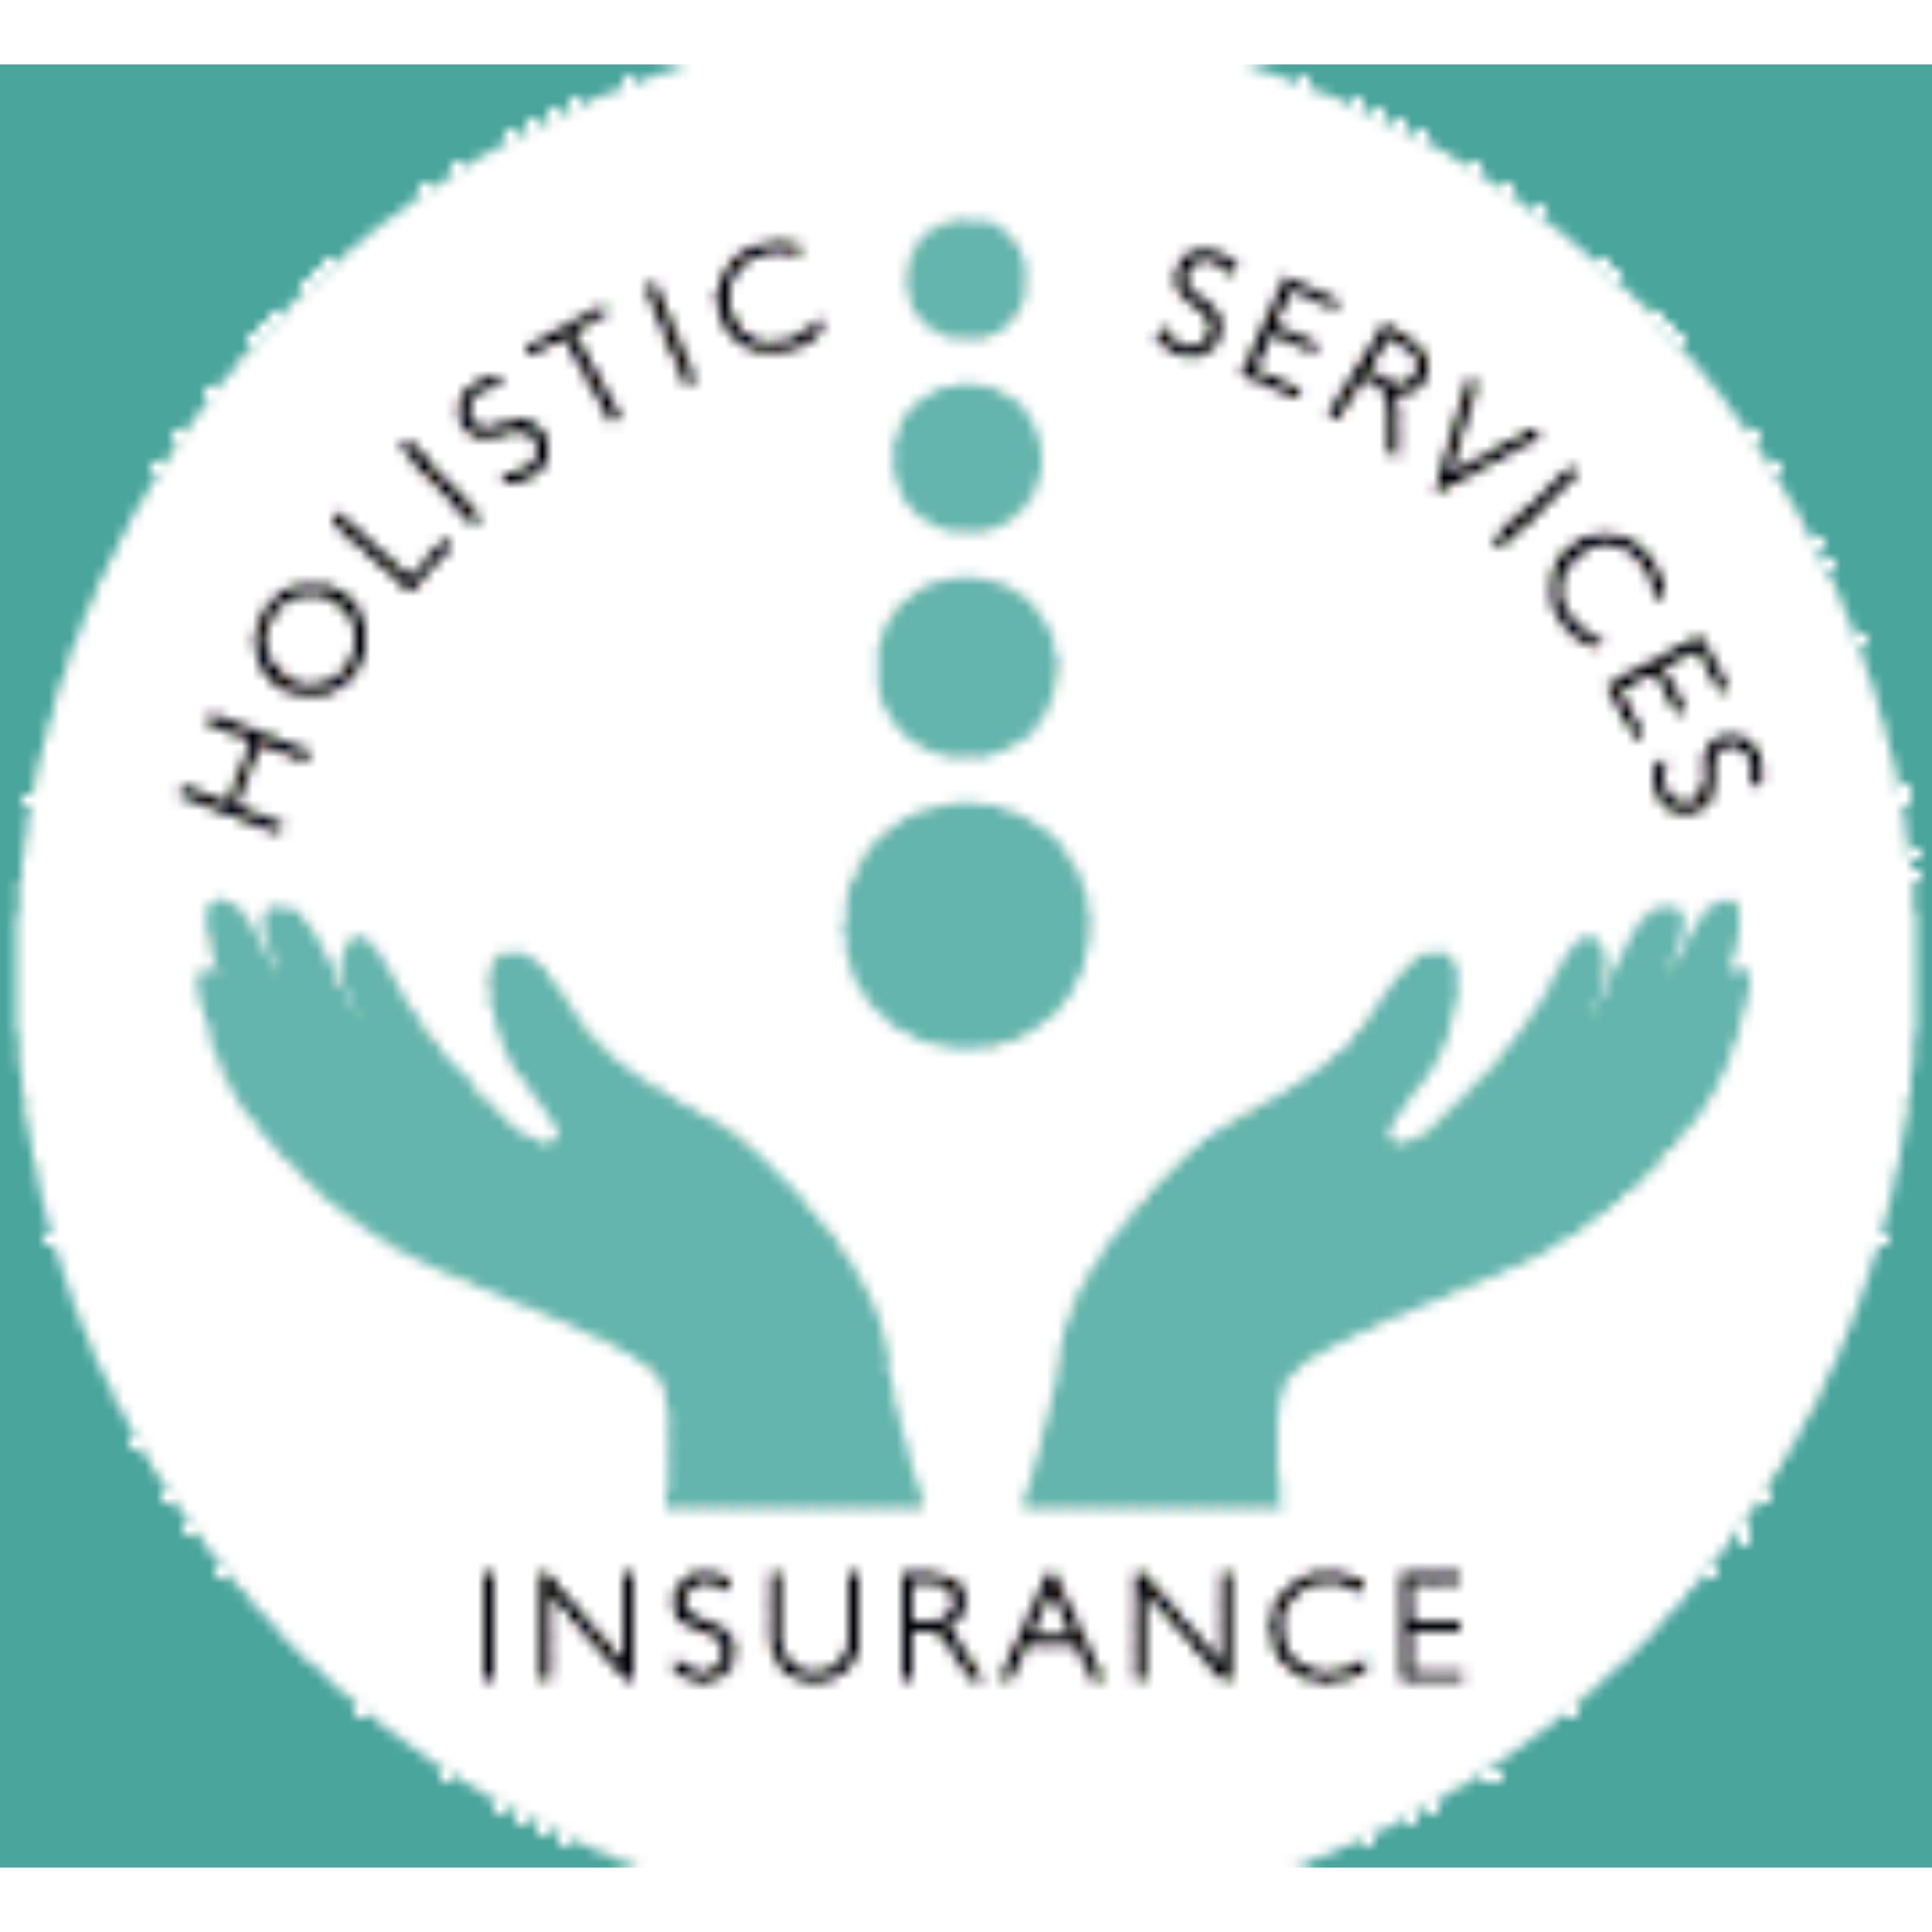 Holistic Insurance Services